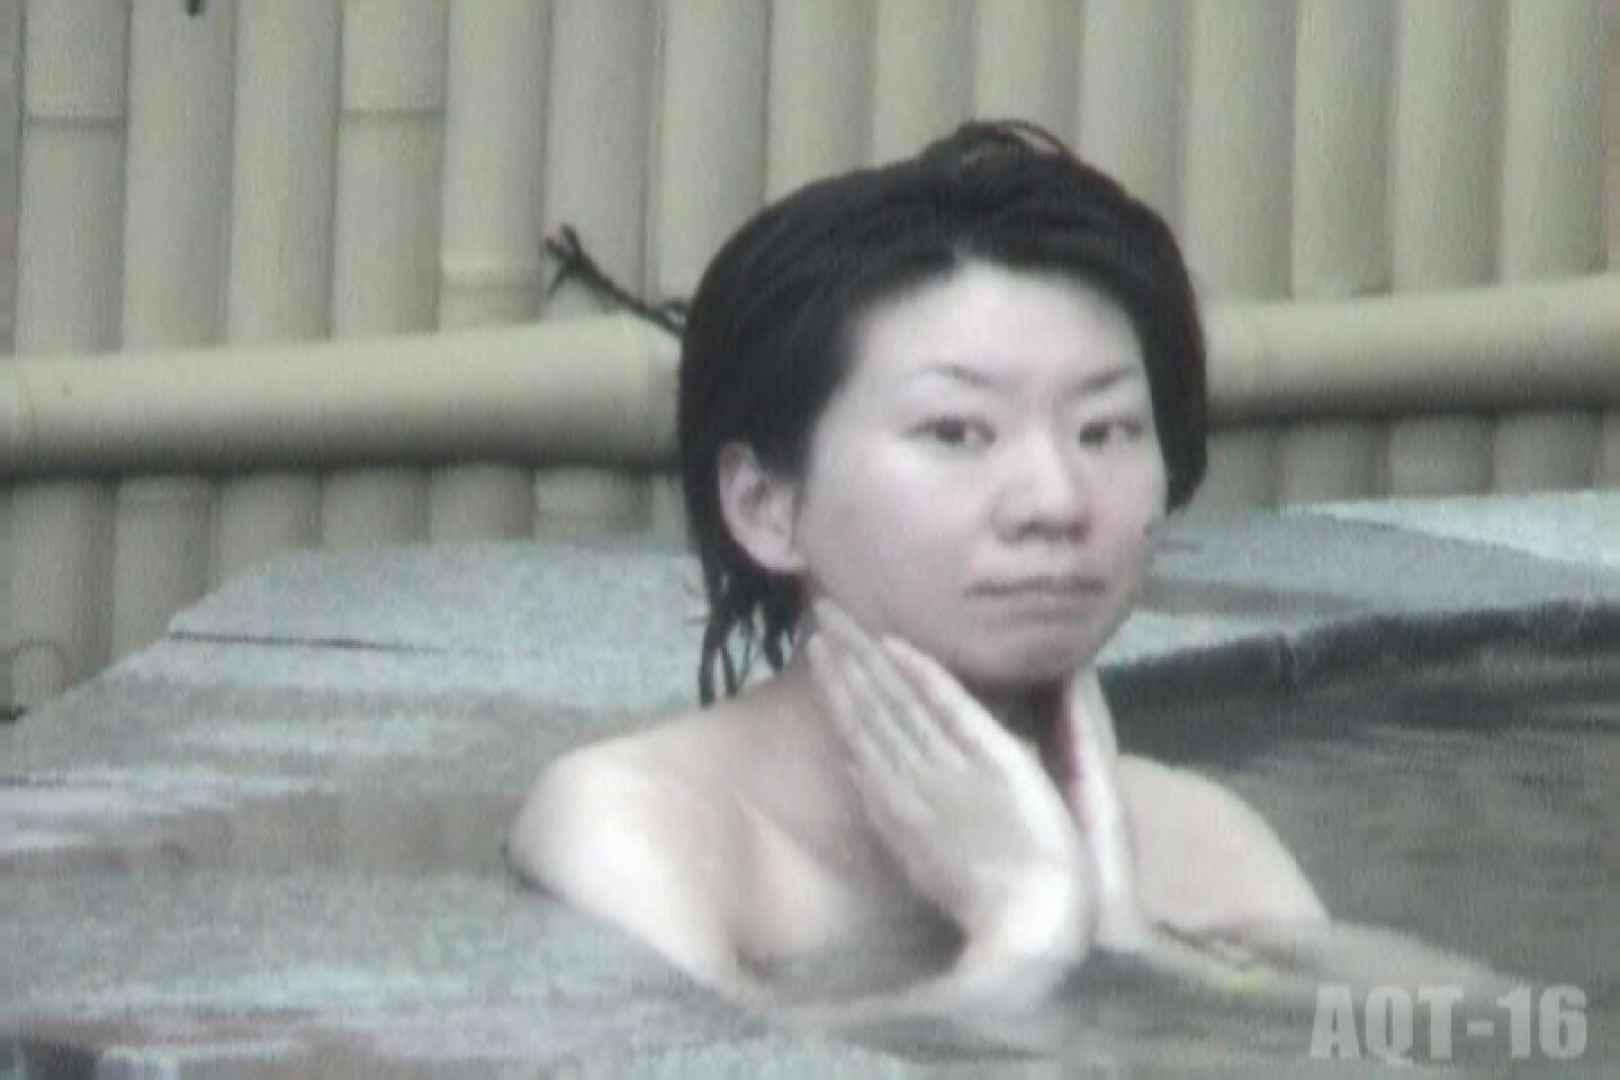 Aquaな露天風呂Vol.842 盗撮師作品  96pic 45